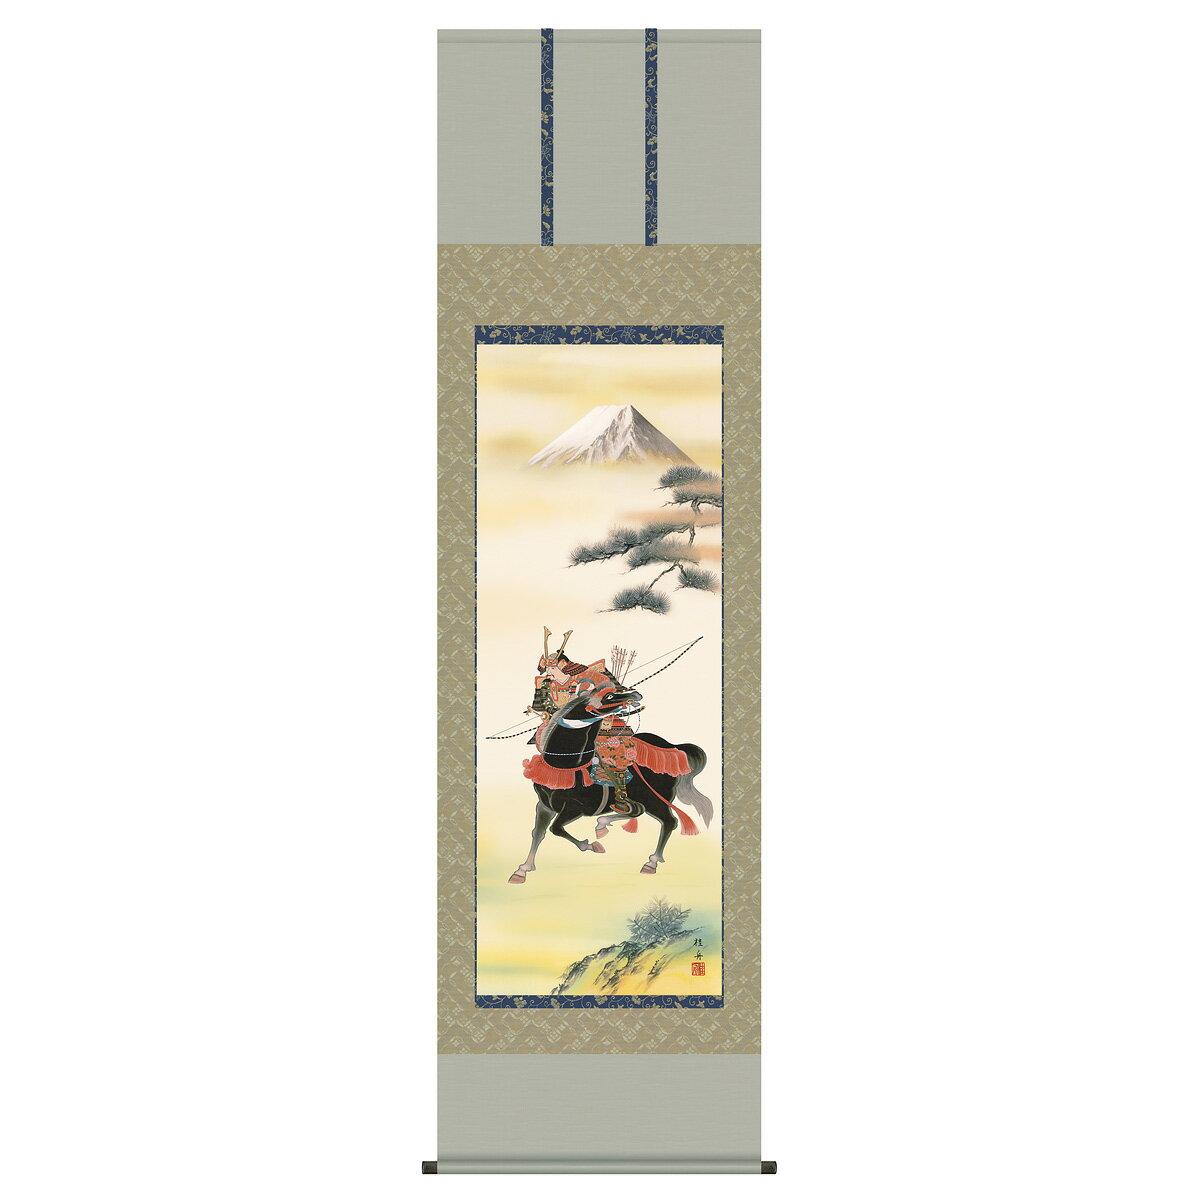 端午の節句 正月 掛け軸 掛軸 「長江桂舟(三美会)作 富峰武者」 ●正月飾り 端午の節句